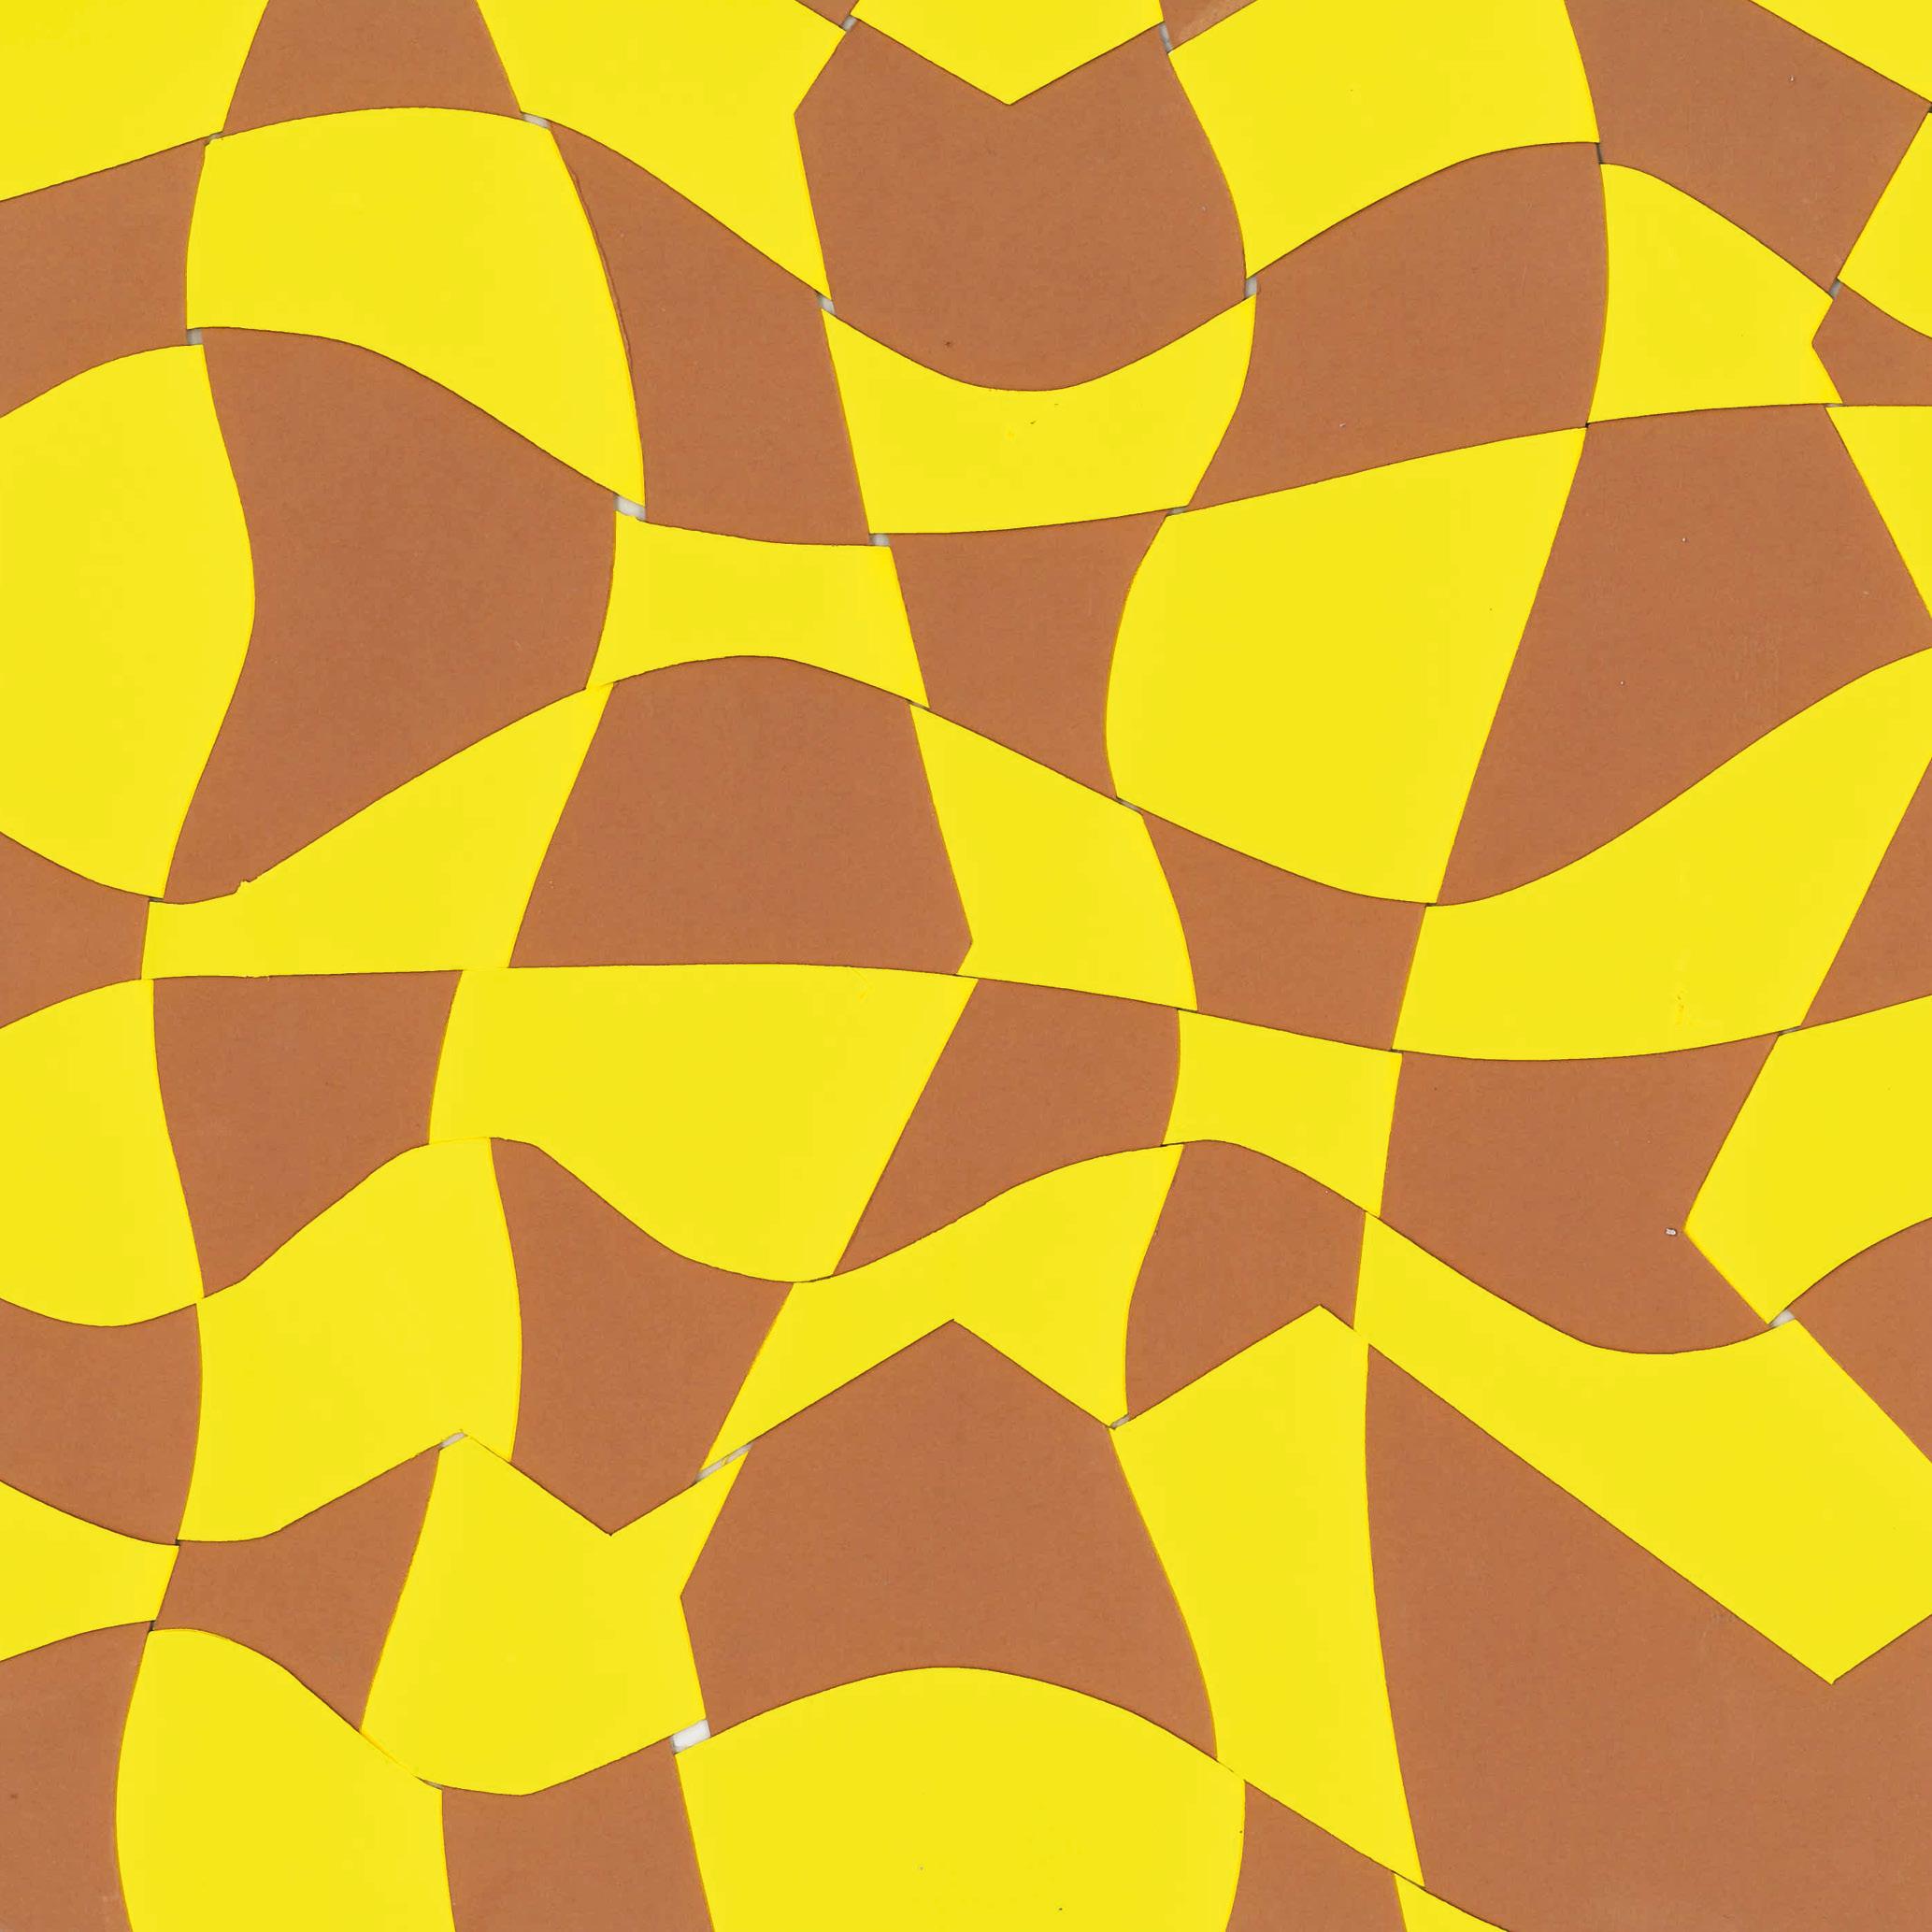 Design by Mils Paper 02